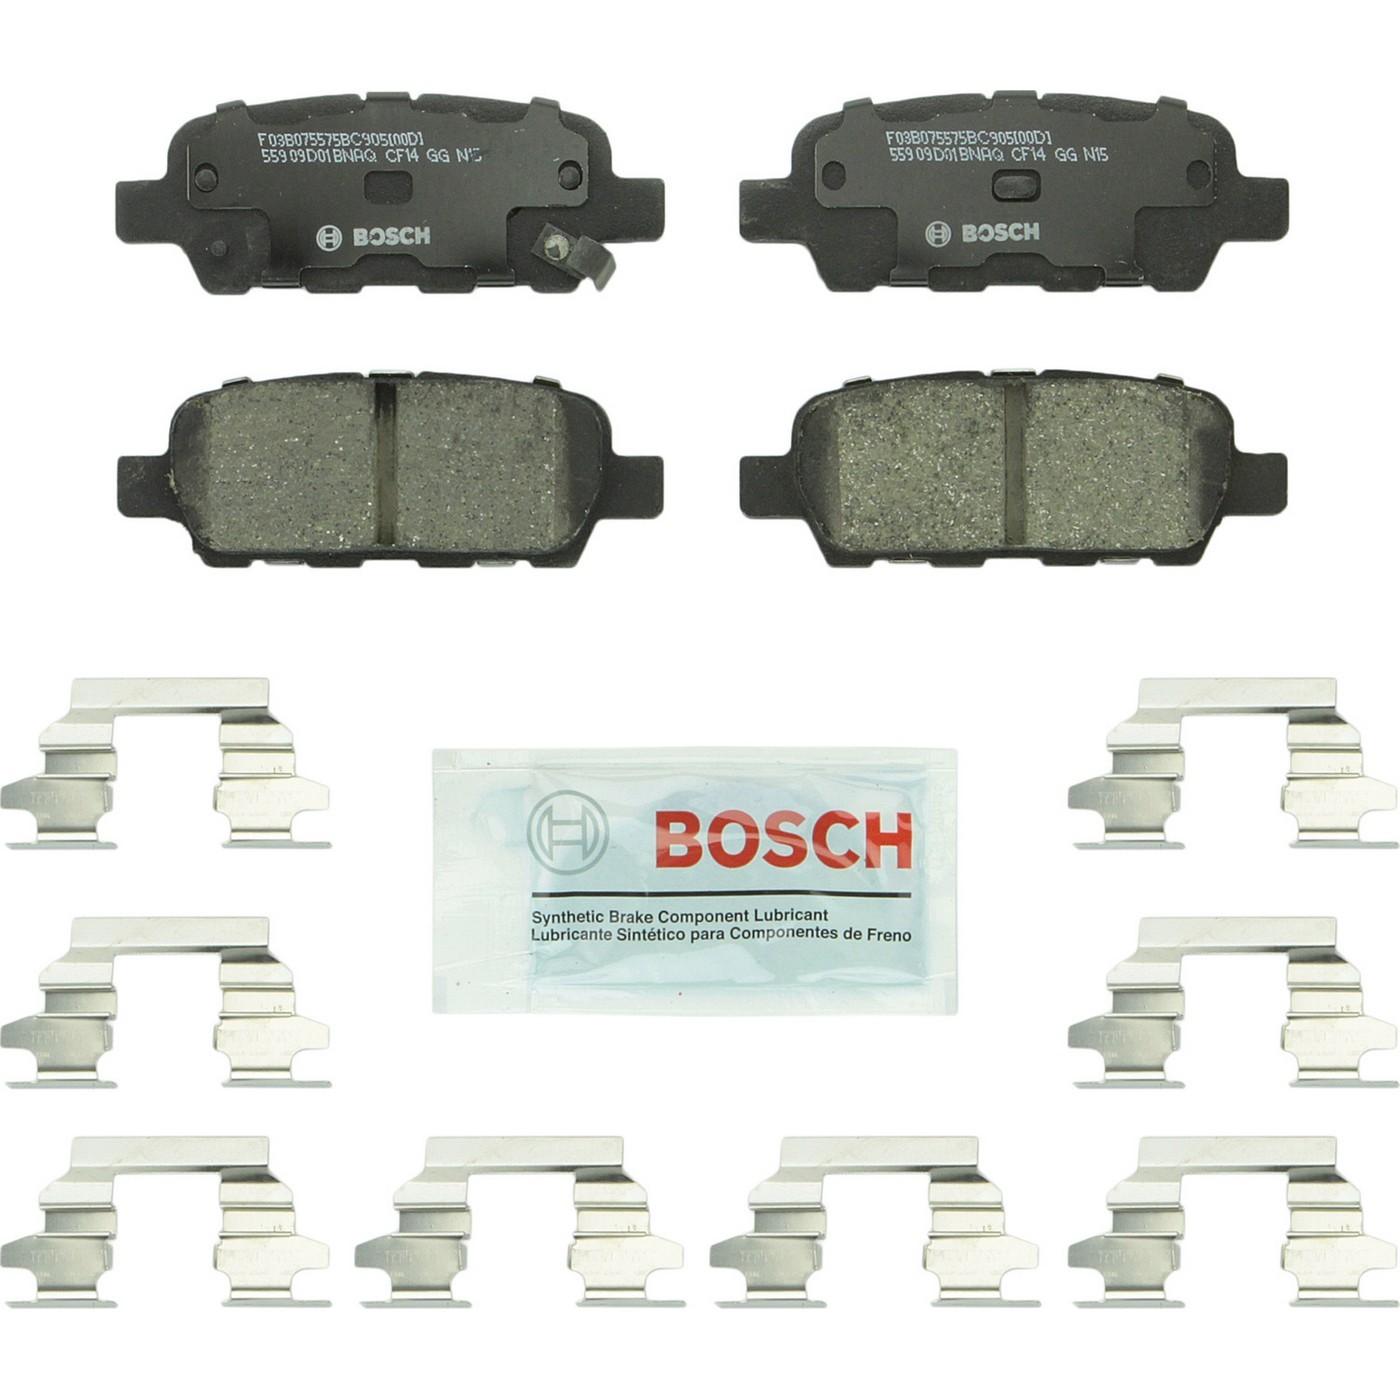 bosch quietcast ceramic brake pads